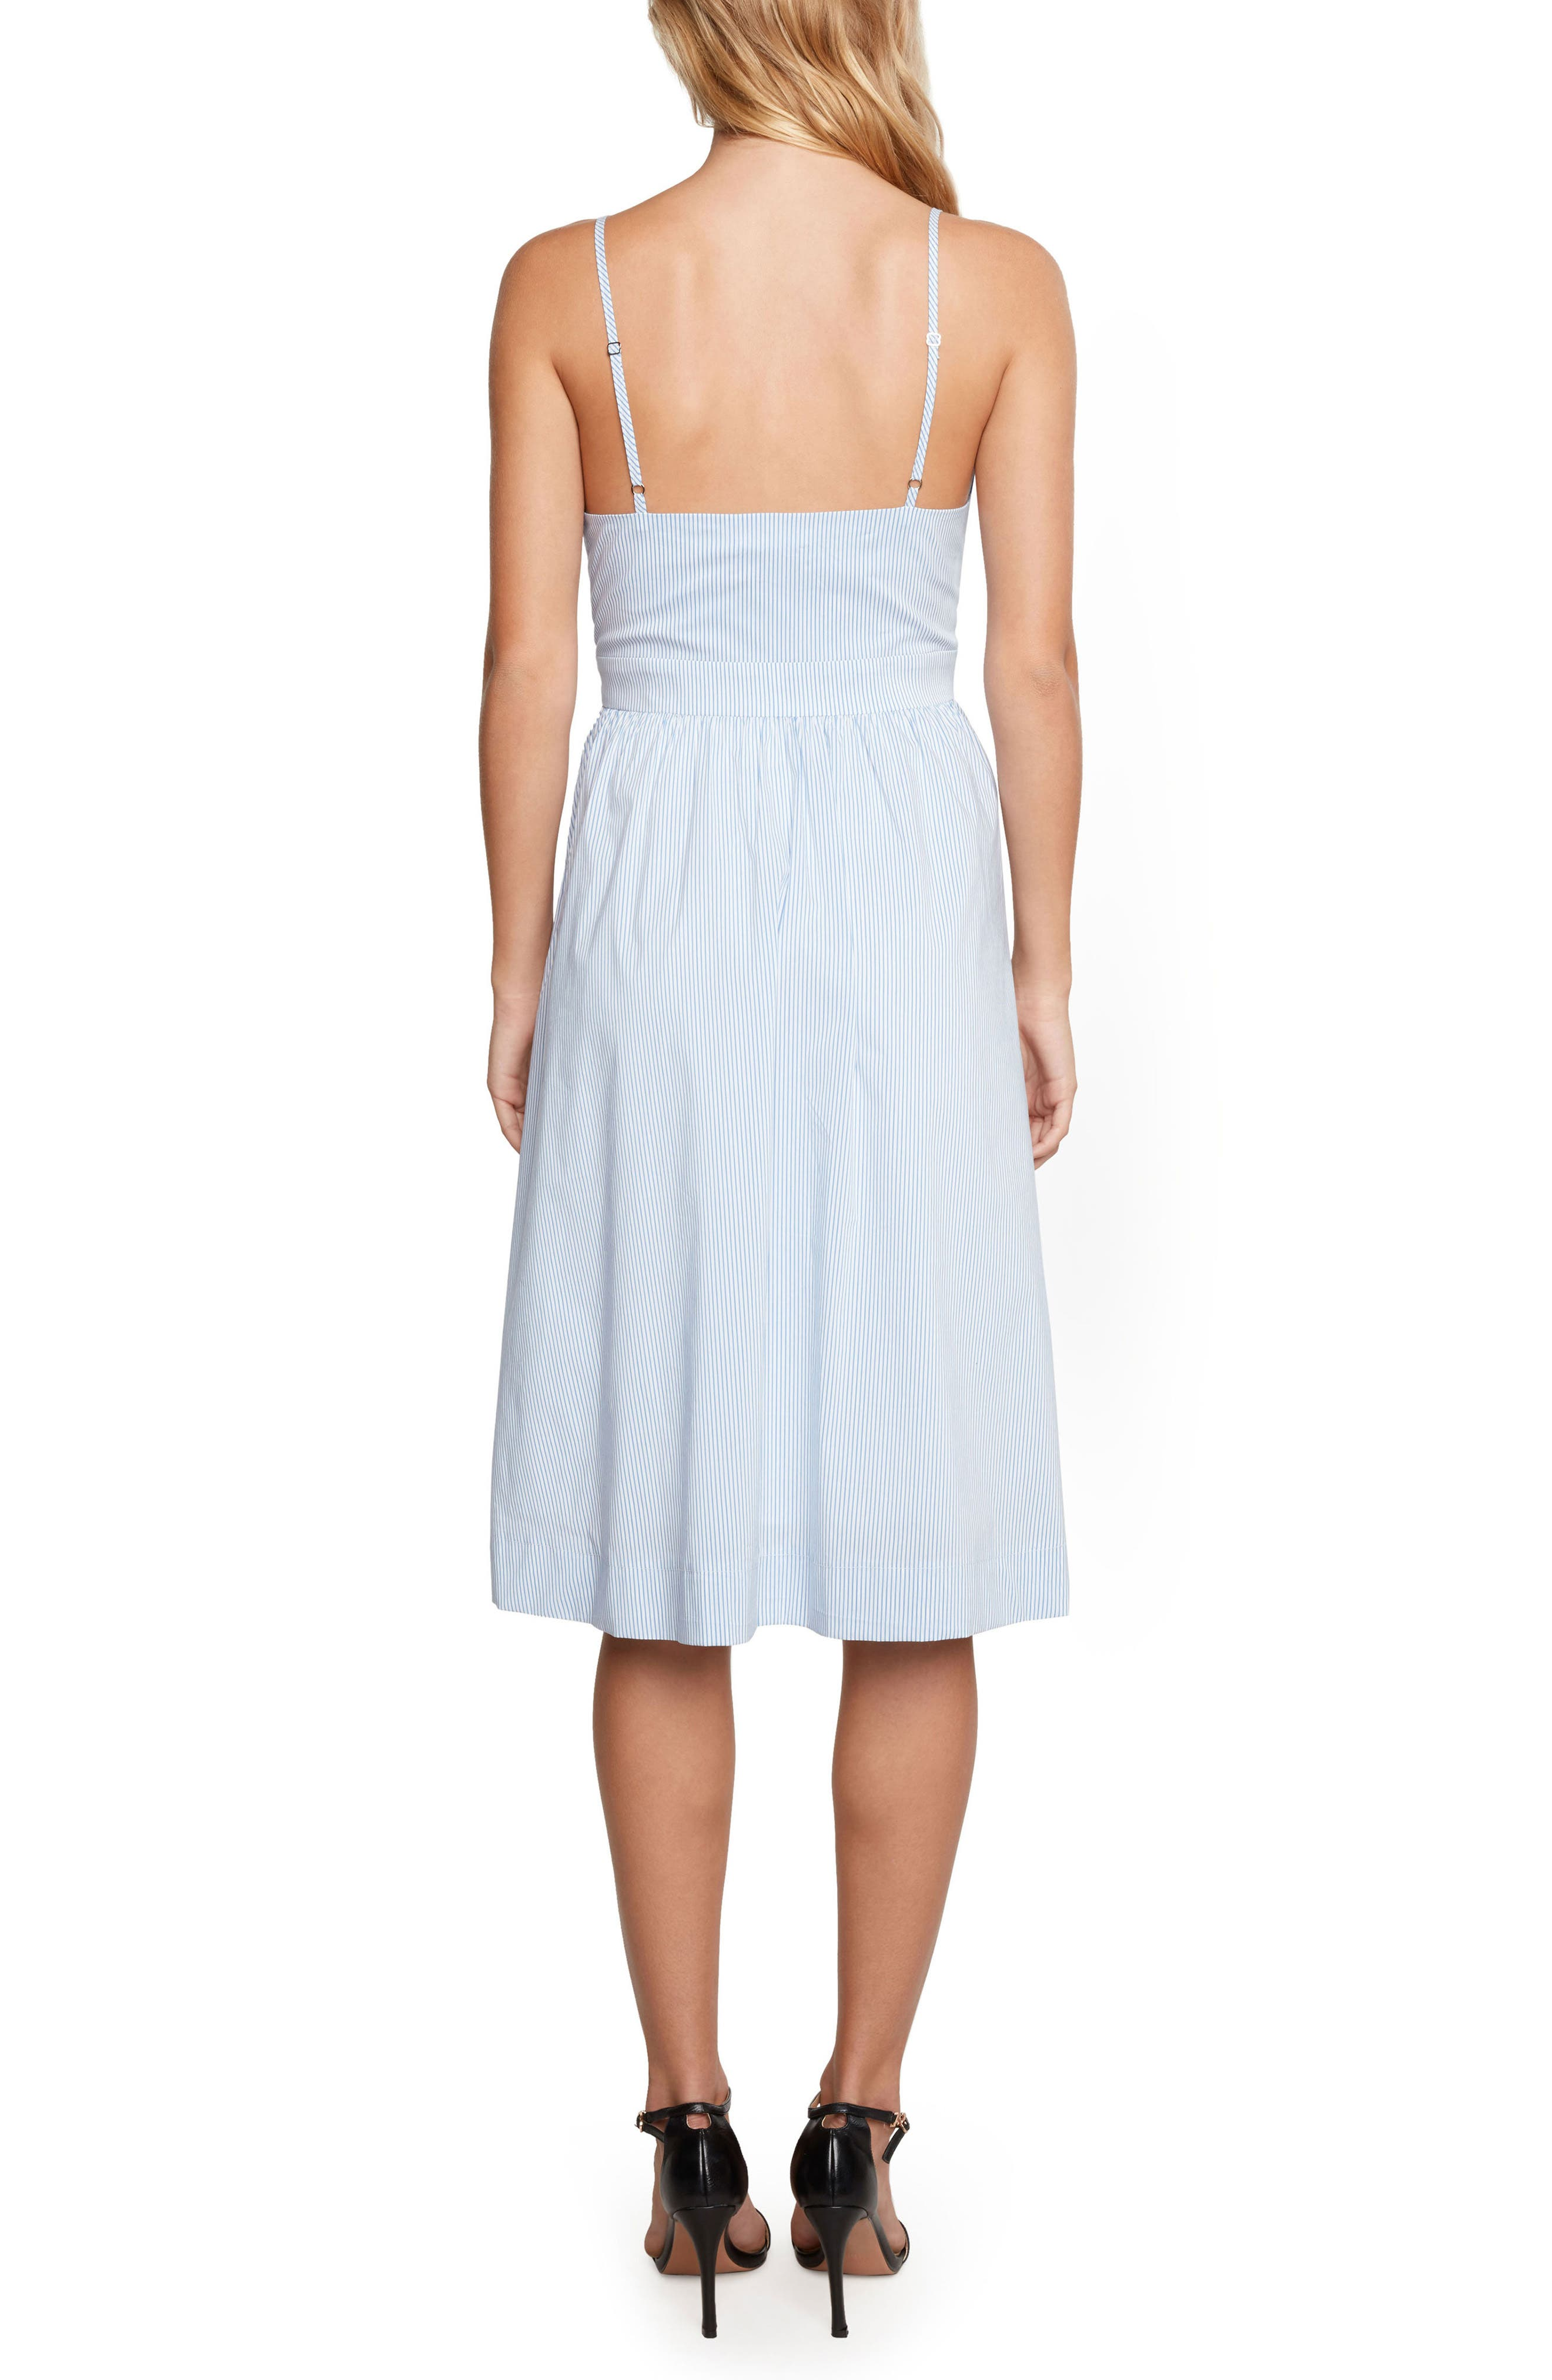 Brenda Tie Front Dress,                             Alternate thumbnail 2, color,                             Chambray